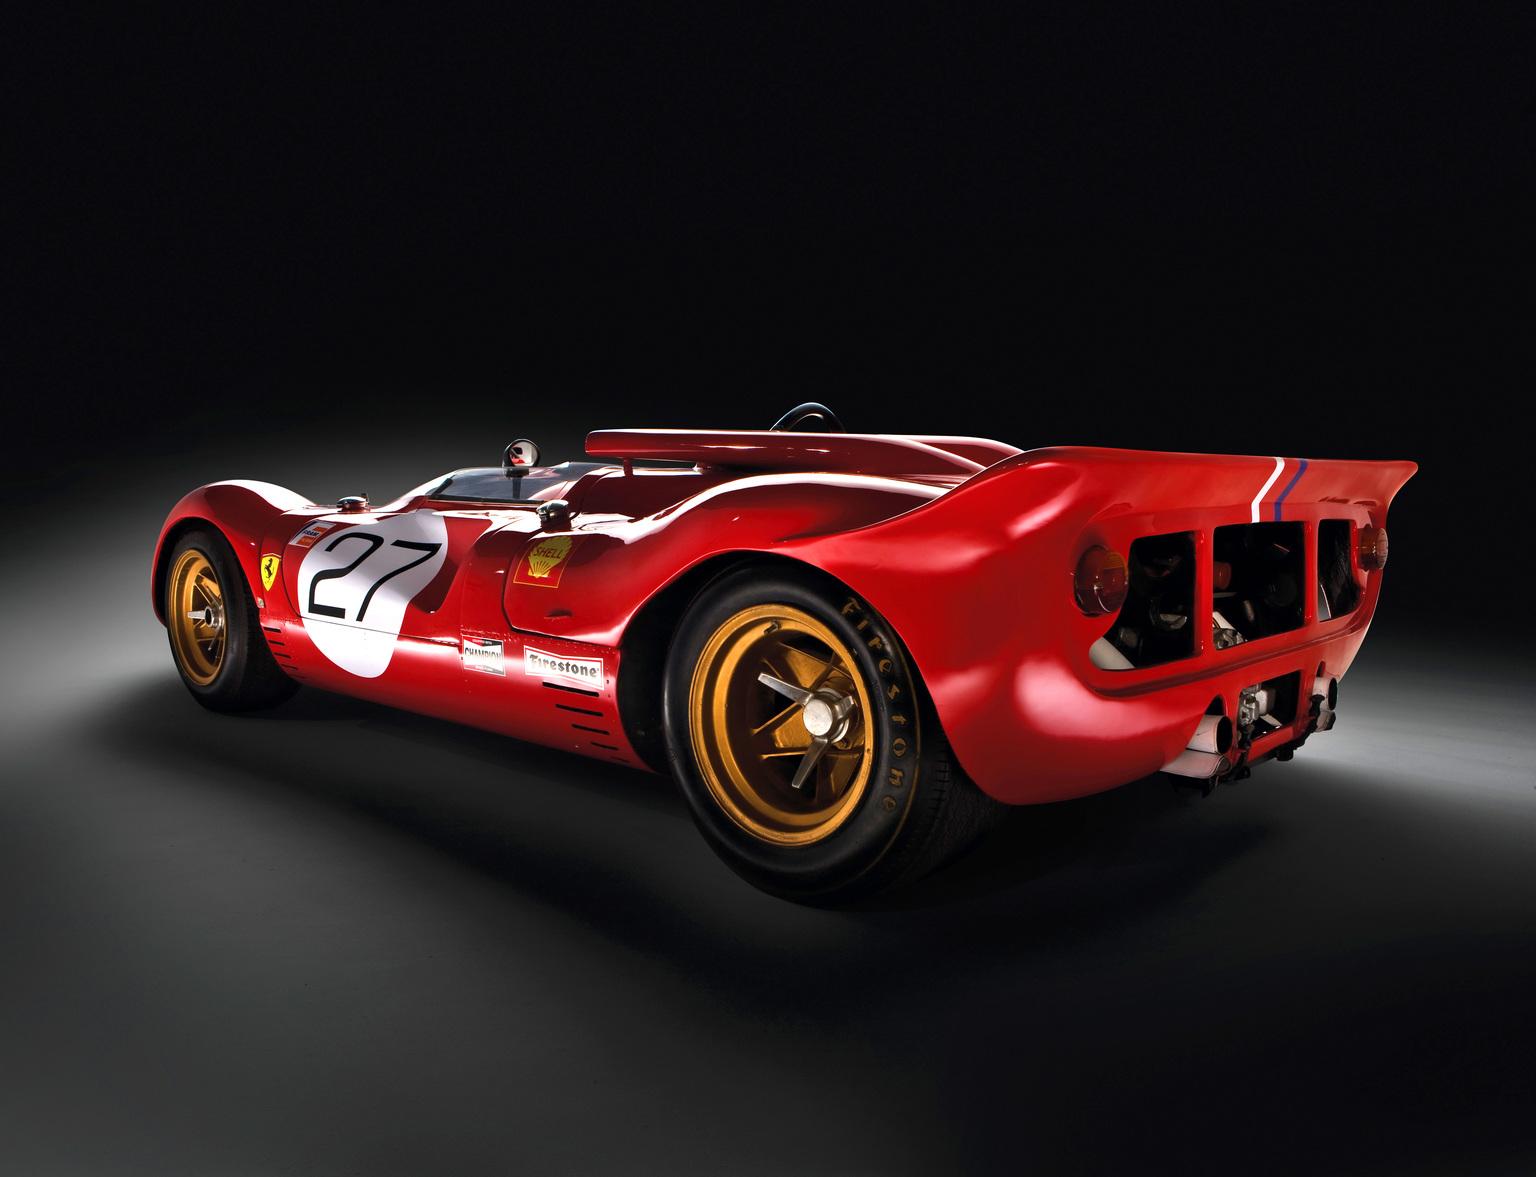 1967 Ferrari 350 Can-Am